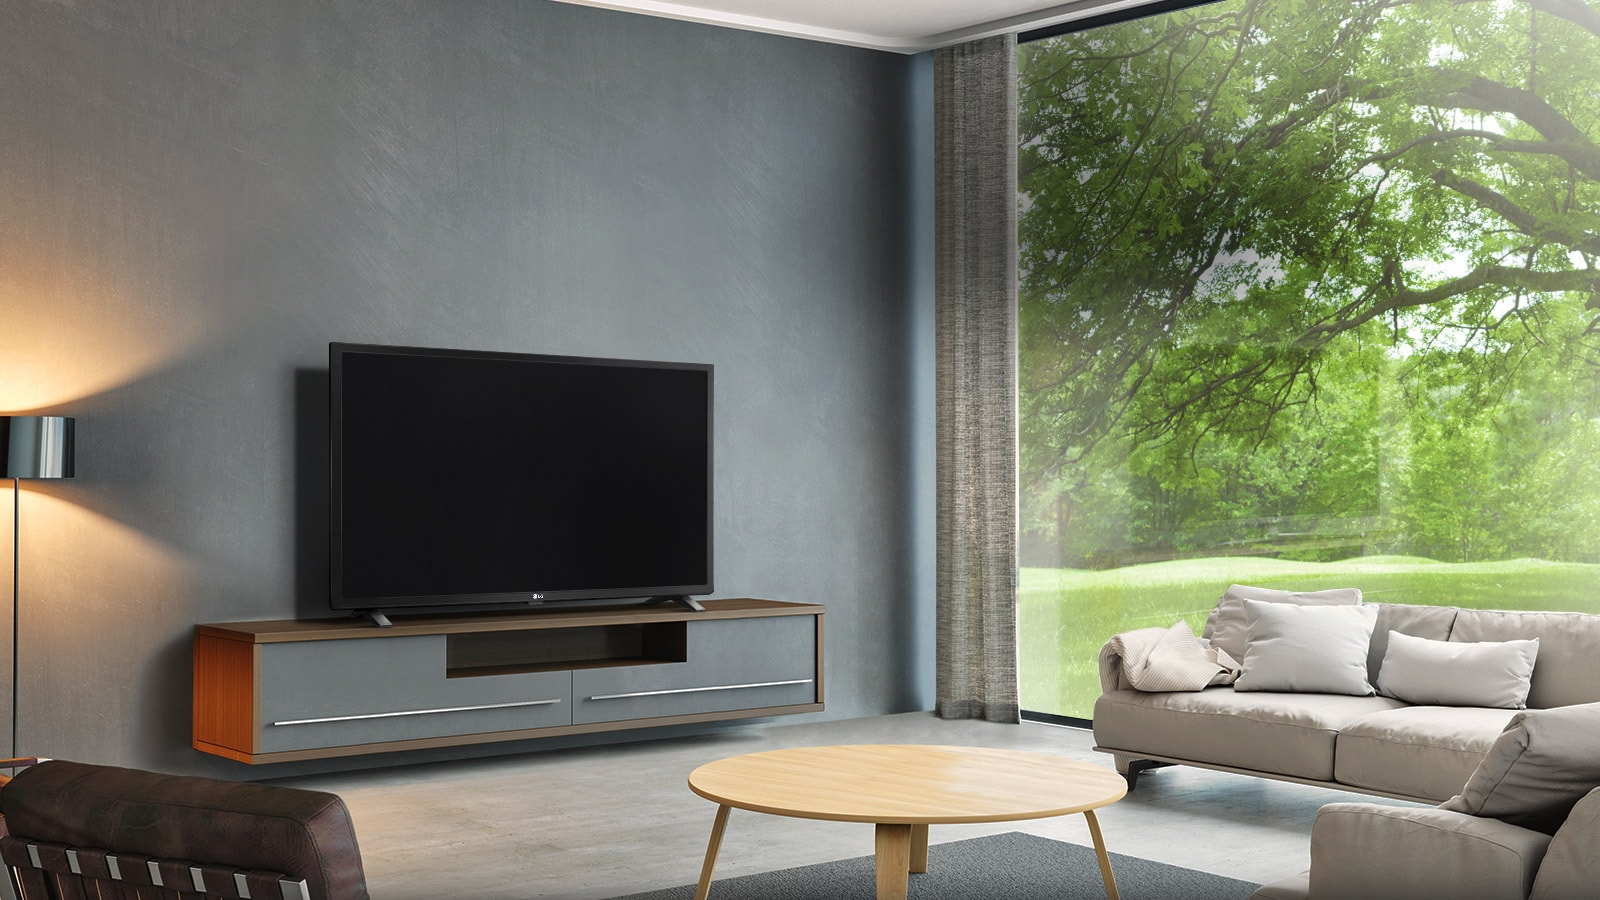 TV-FHD-43-LM55-05-Design-Desktop